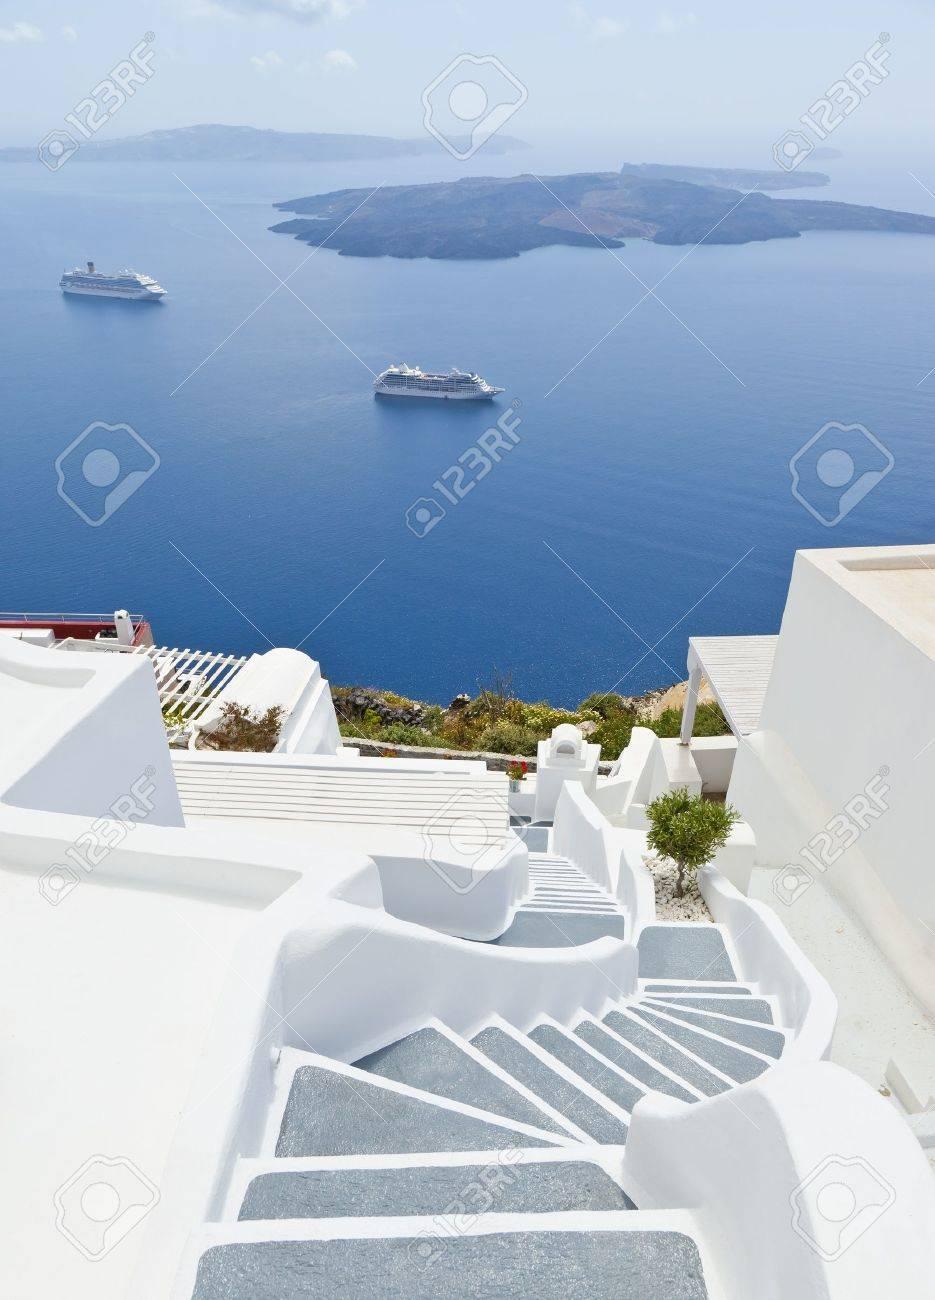 An image of Santorini island of Greece Stock Photo - 9601683